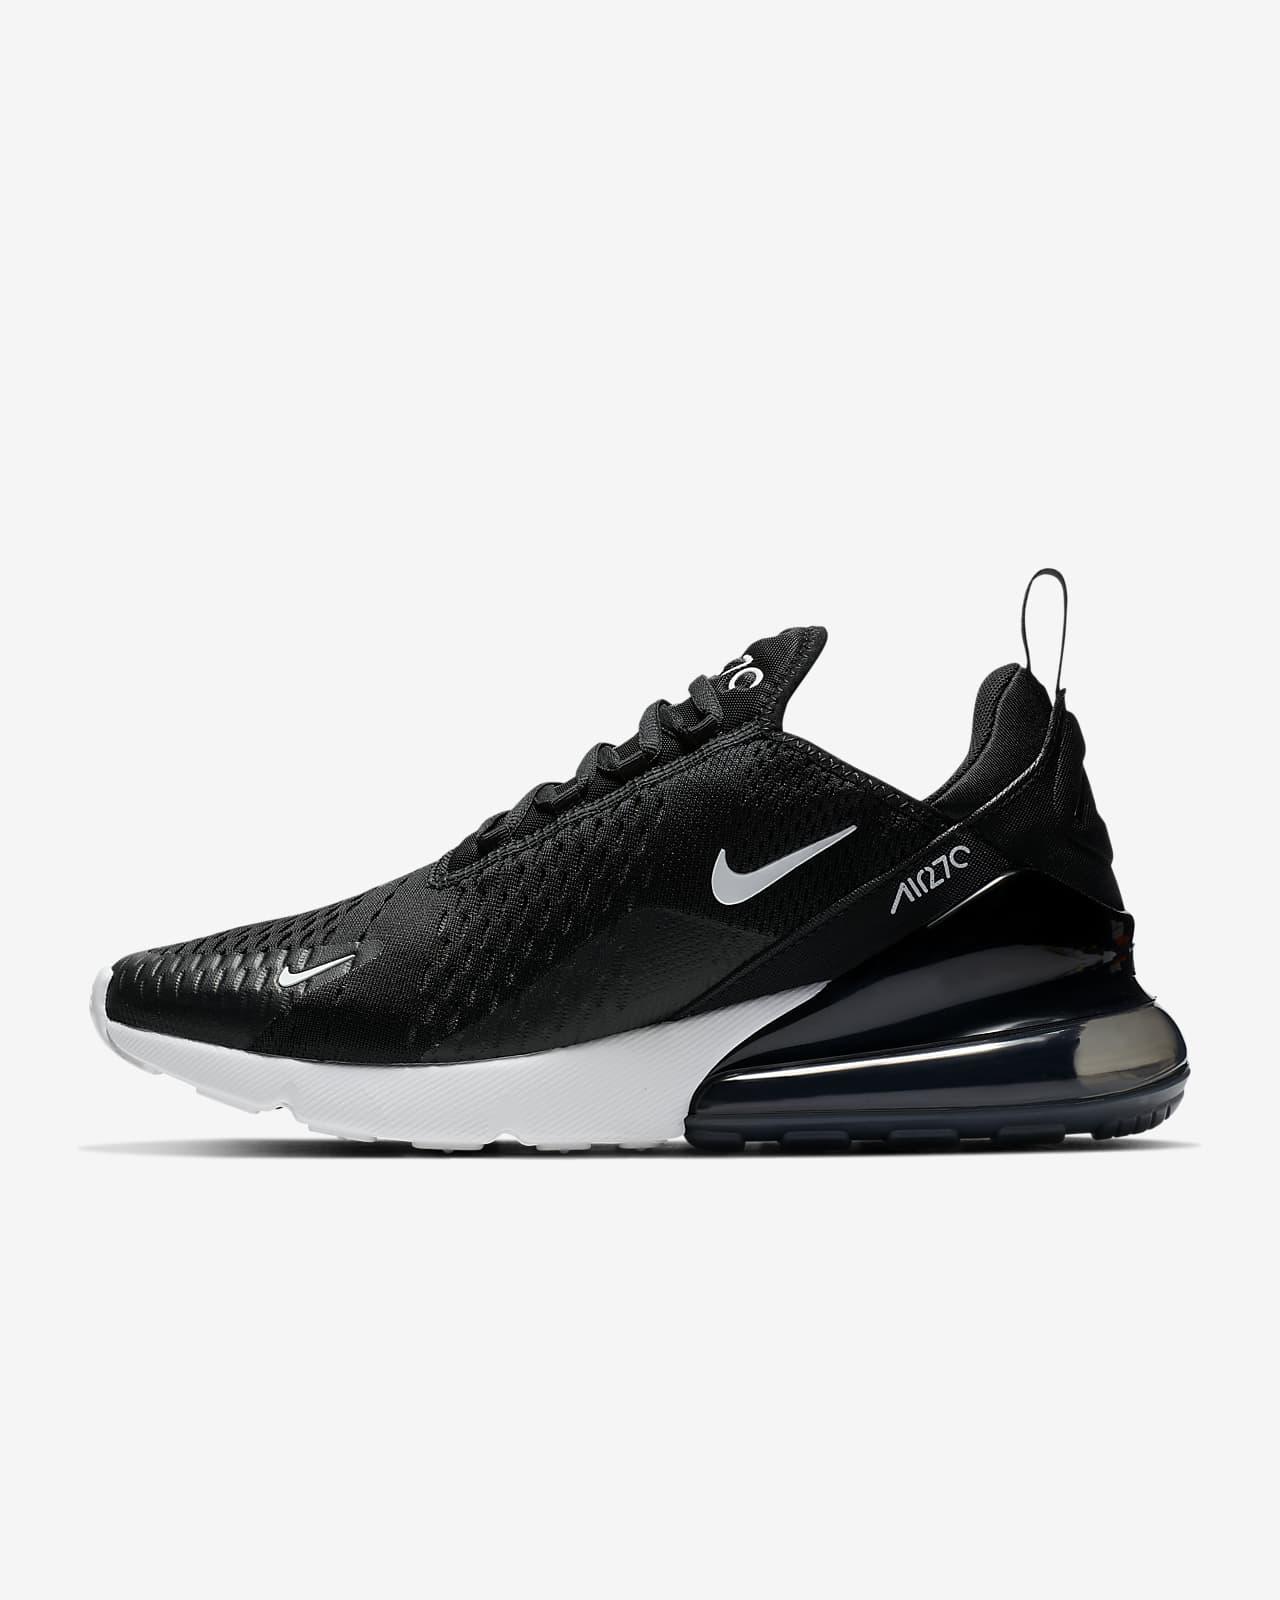 nike chaussure femme noire